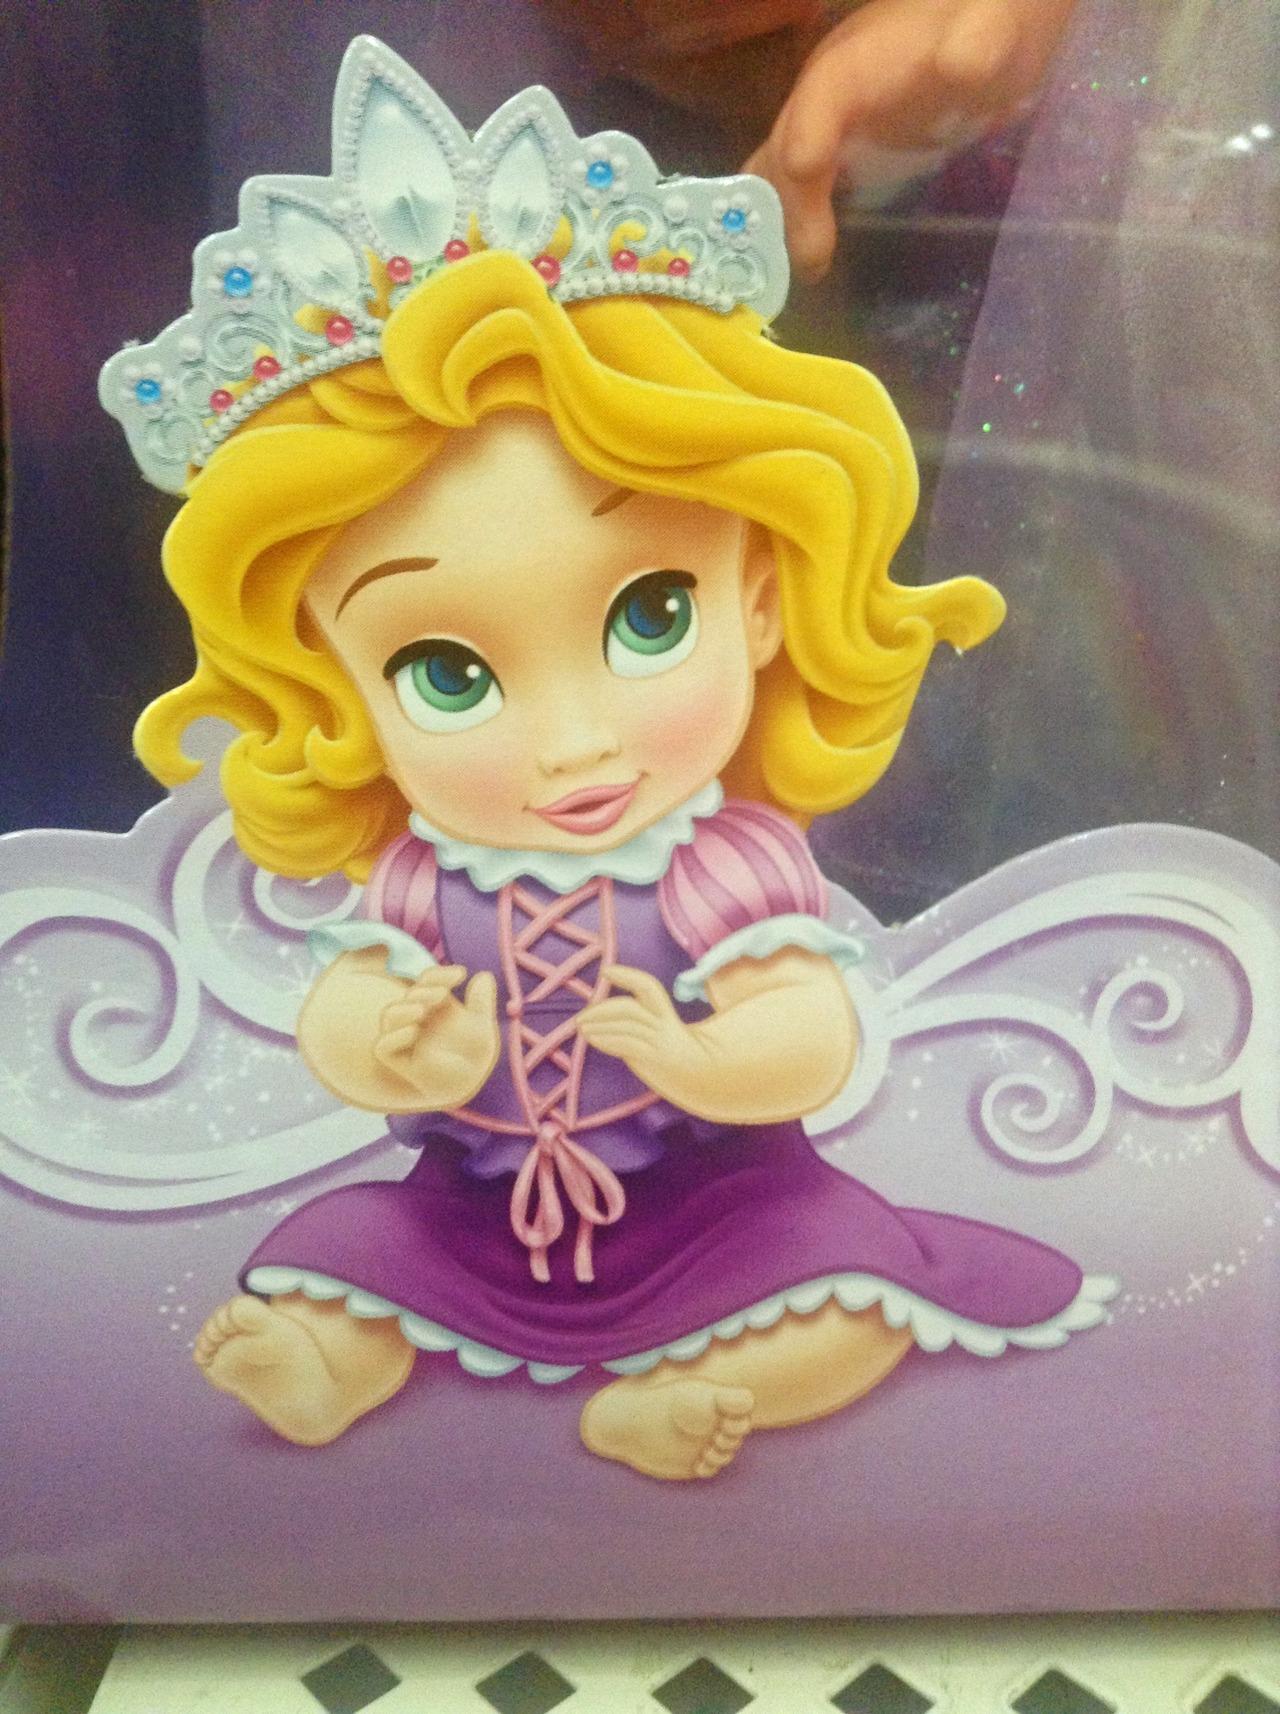 Disney Little Princess by ArsalanKhanArtist on DeviantArt |Baby Disney Princess